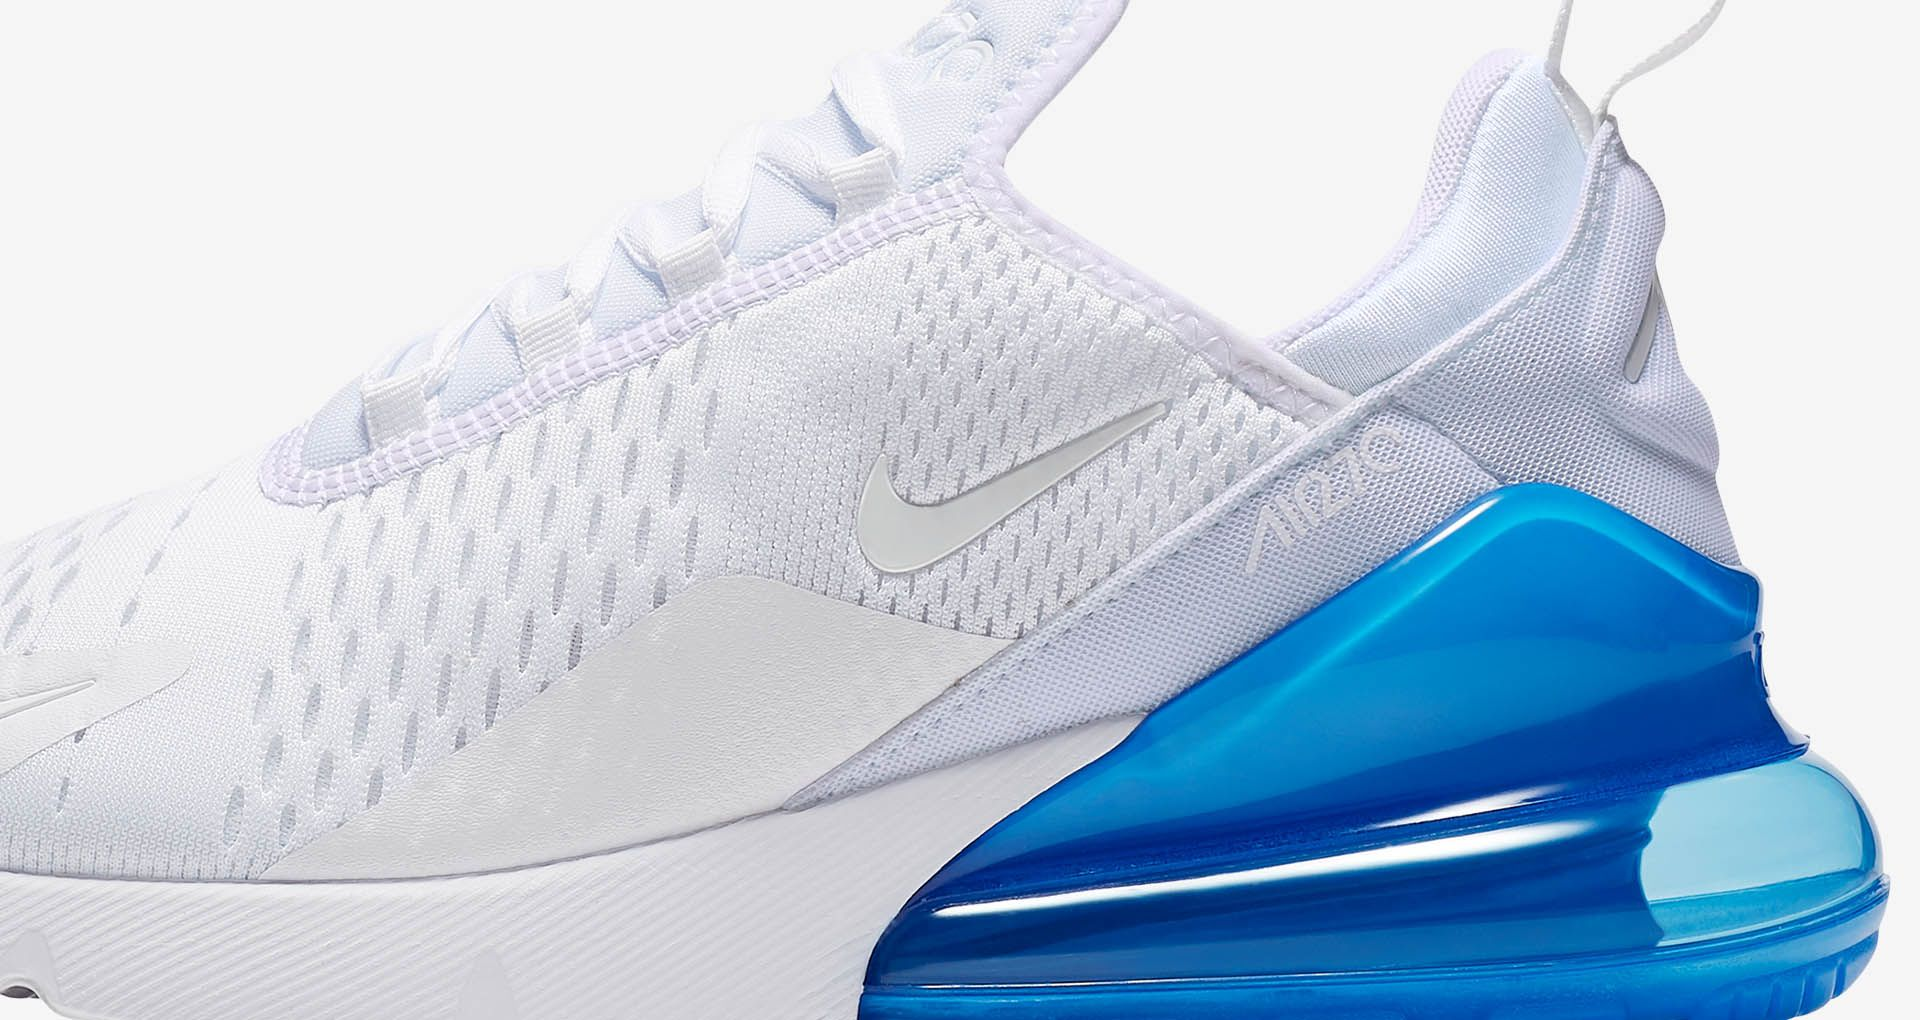 b2e97d8e56 Nike Air Max 270 White Pack 'Photo Blue' Release Date. Nike+ Launch SI